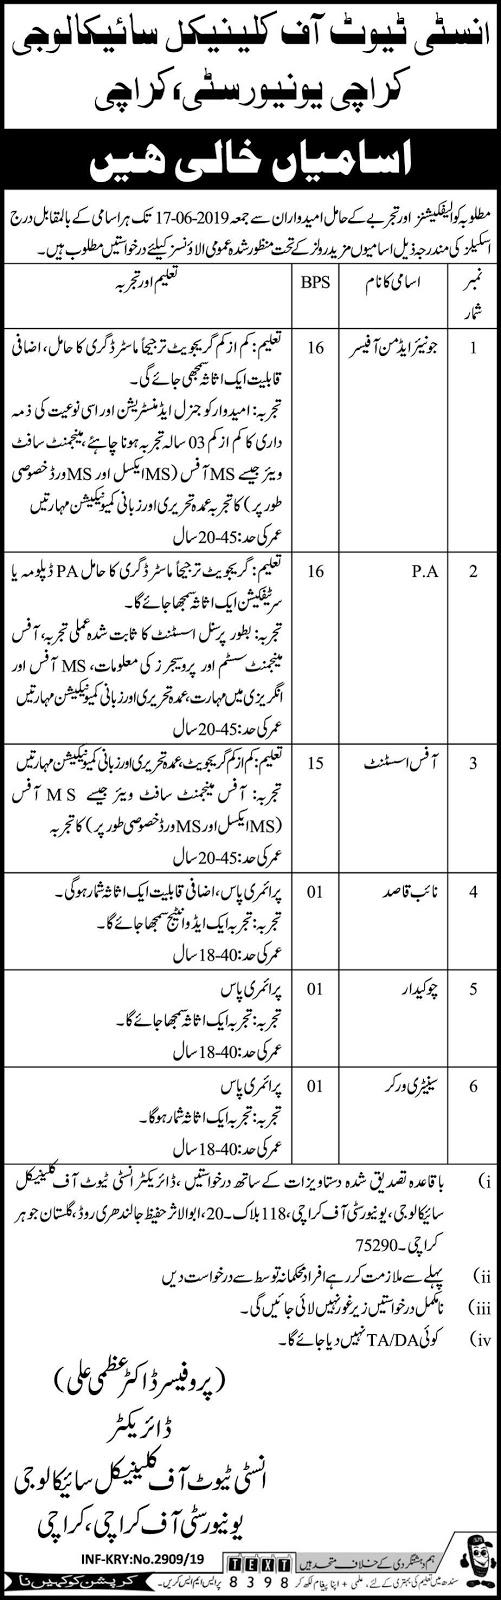 Institute of Clinical Psychology Karachi University 2019 Latest Jobs